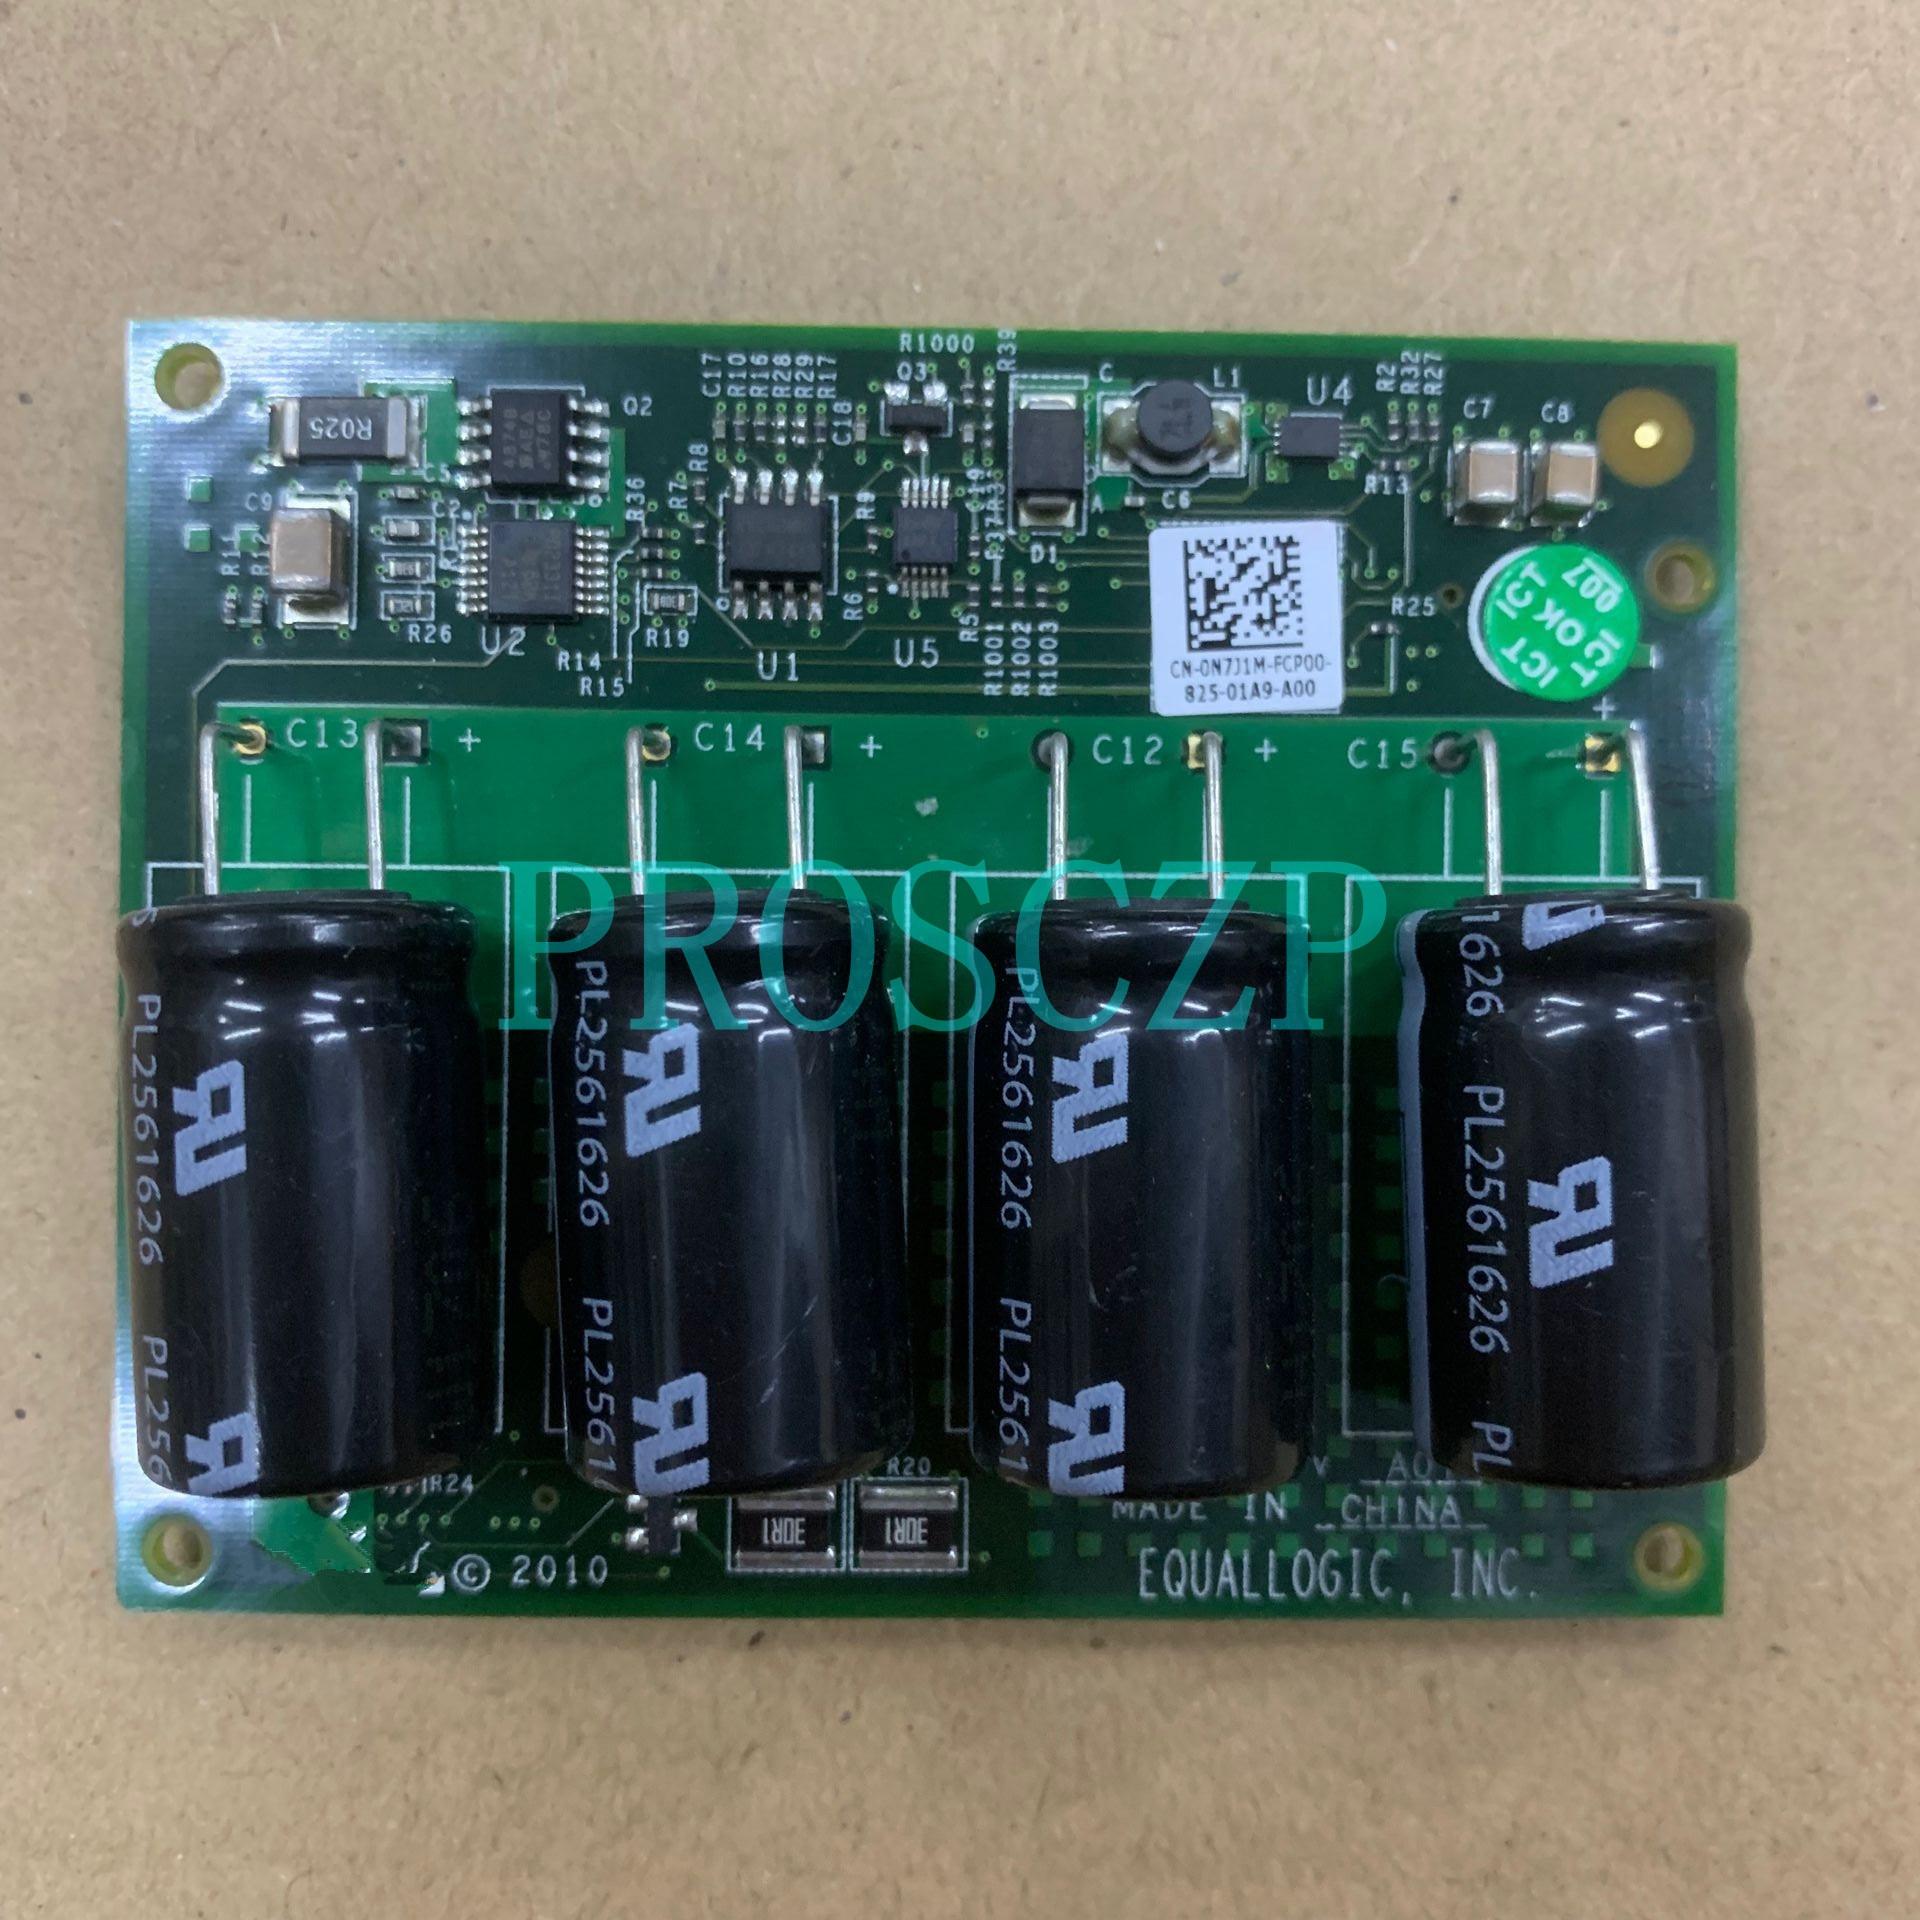 Freies verschiffen Für PS4100 PS6100 PS6110 PS6210 Laptop motherboard CN-0N7J1M 0N7J1M N7J1M C2F Controller Batterie 100% arbeits gut